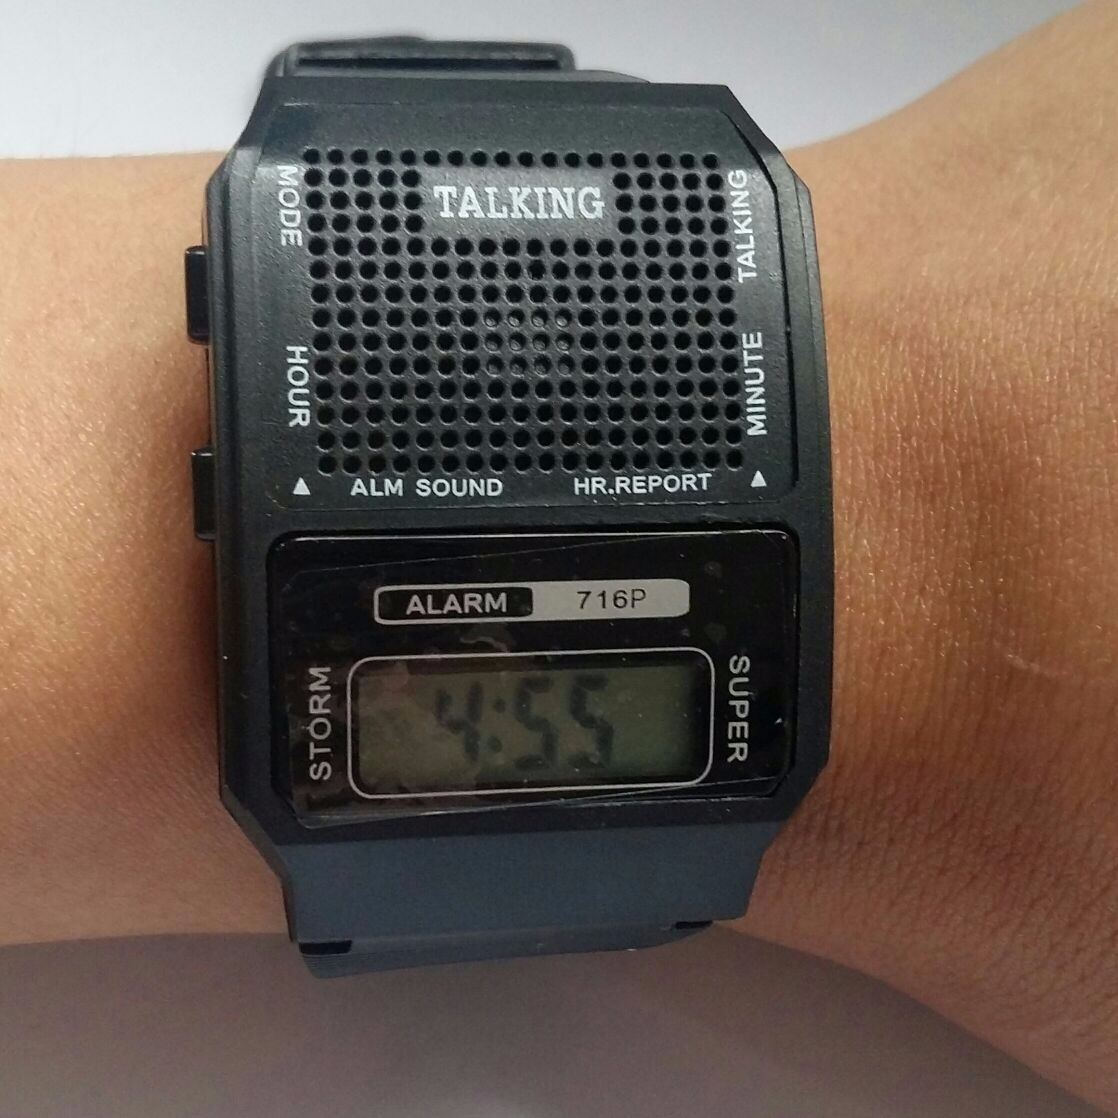 370dda67b78 relógio fala hora portugues deficiente visual e idoso. Carregando zoom.